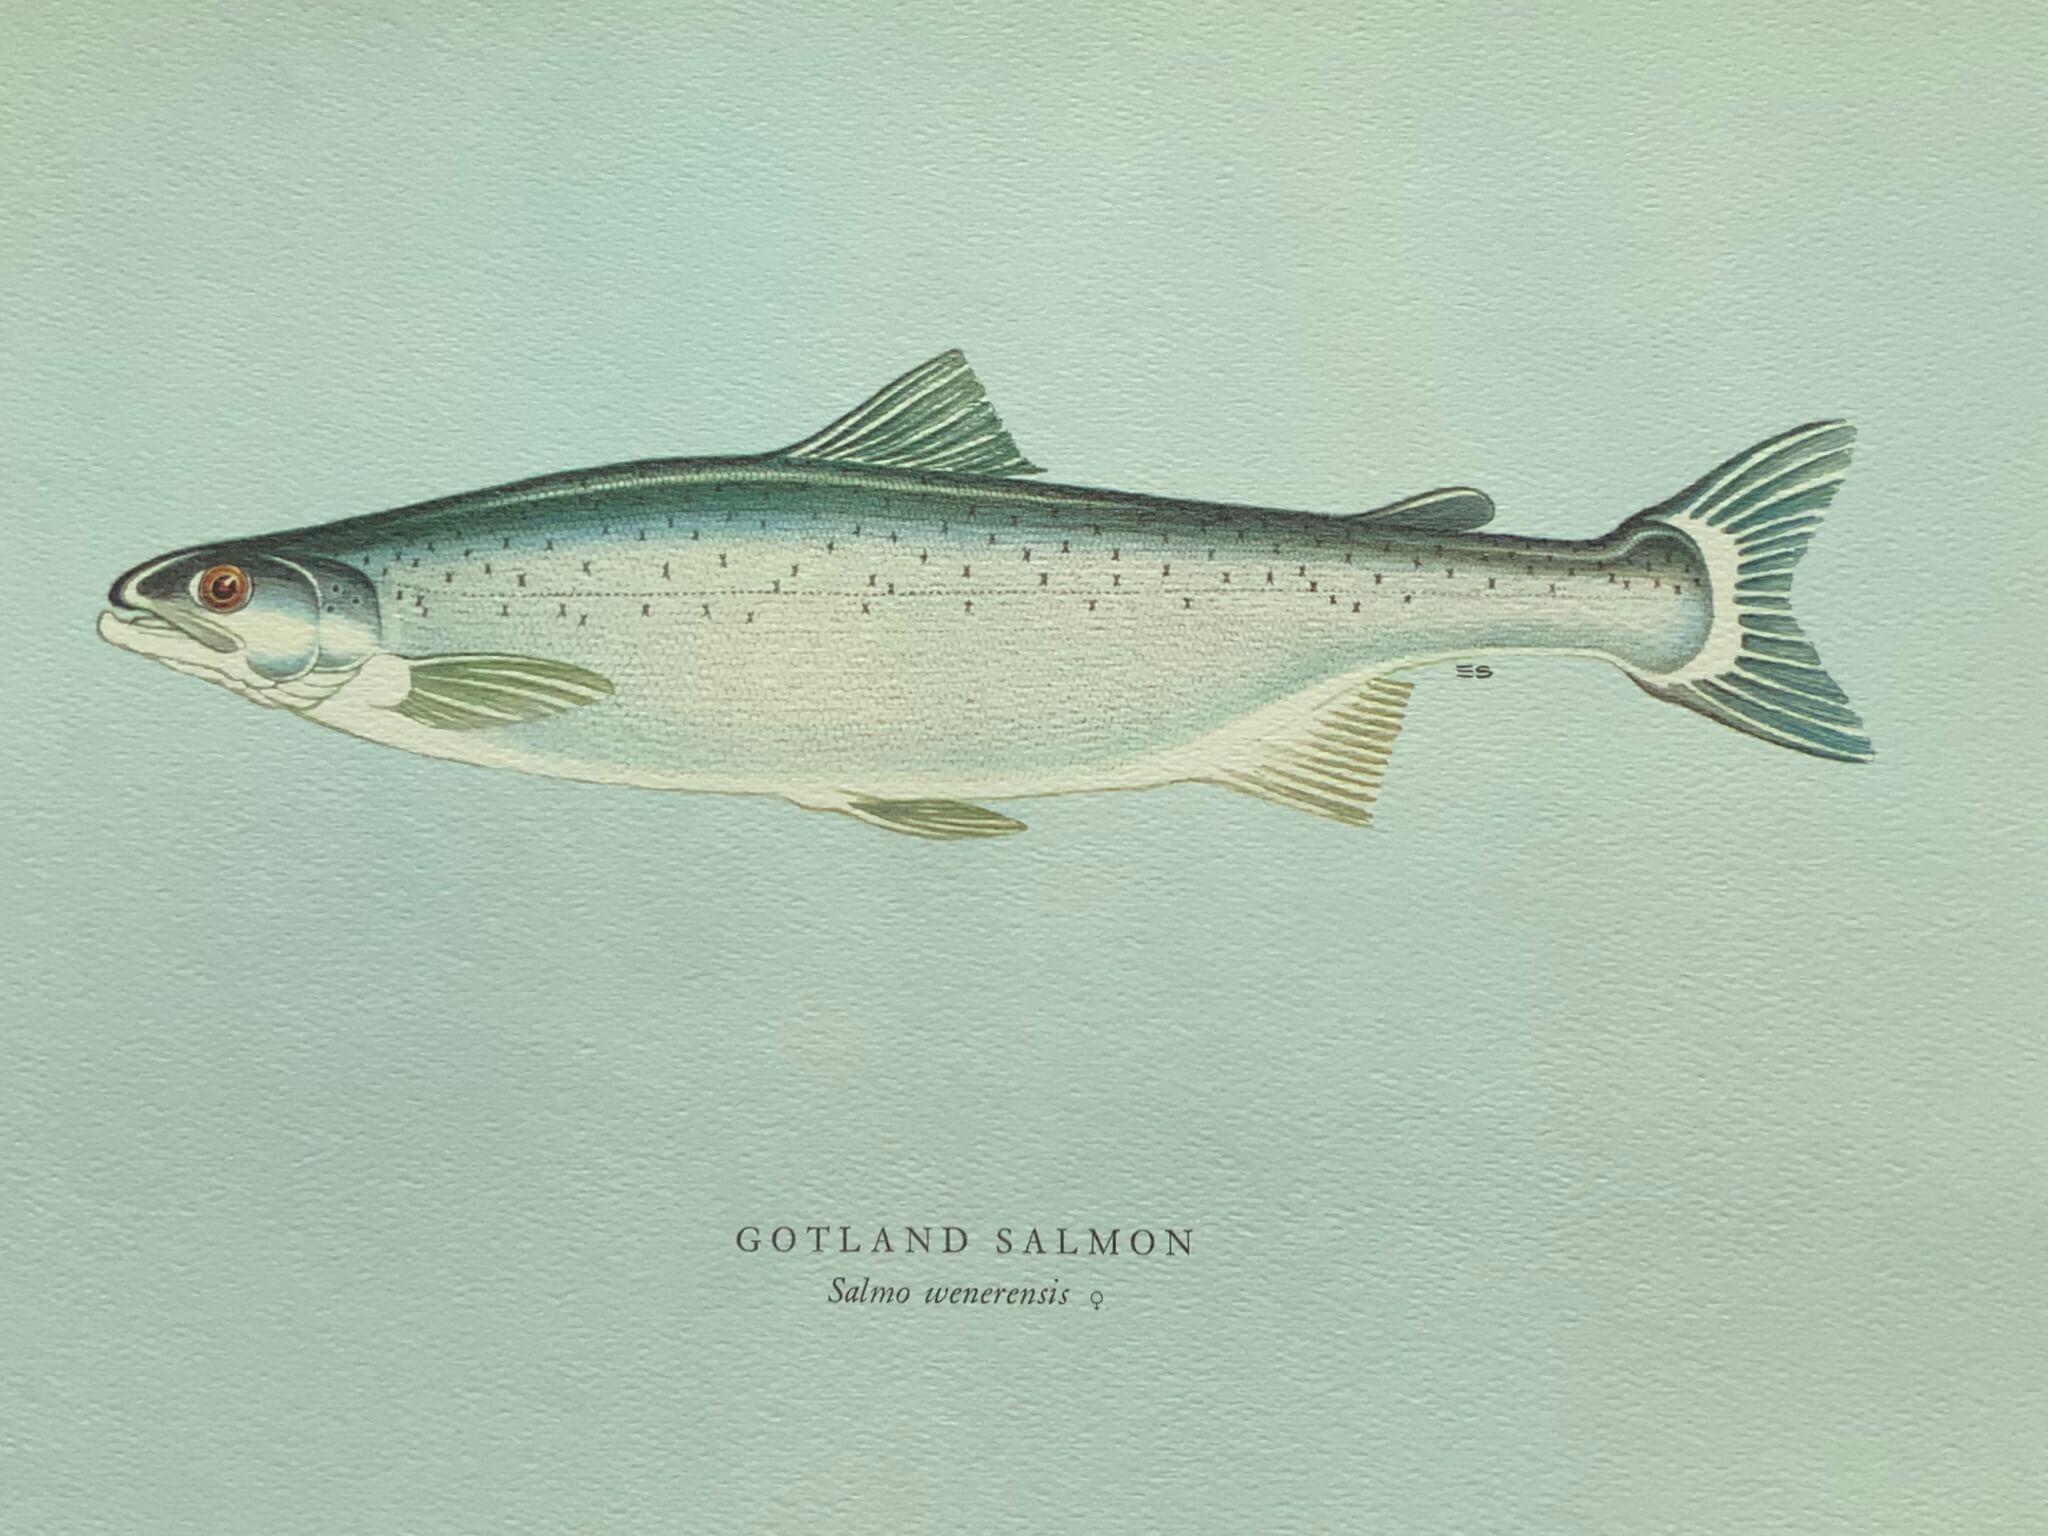 Gotland salmon 瑞典鮭魚 通常出沒於瑞典大湖之中,是大西洋鮭魚的一種; 體形纖麗,尾部細長,一般重六至八磅,最受釣魚一族歡迎。